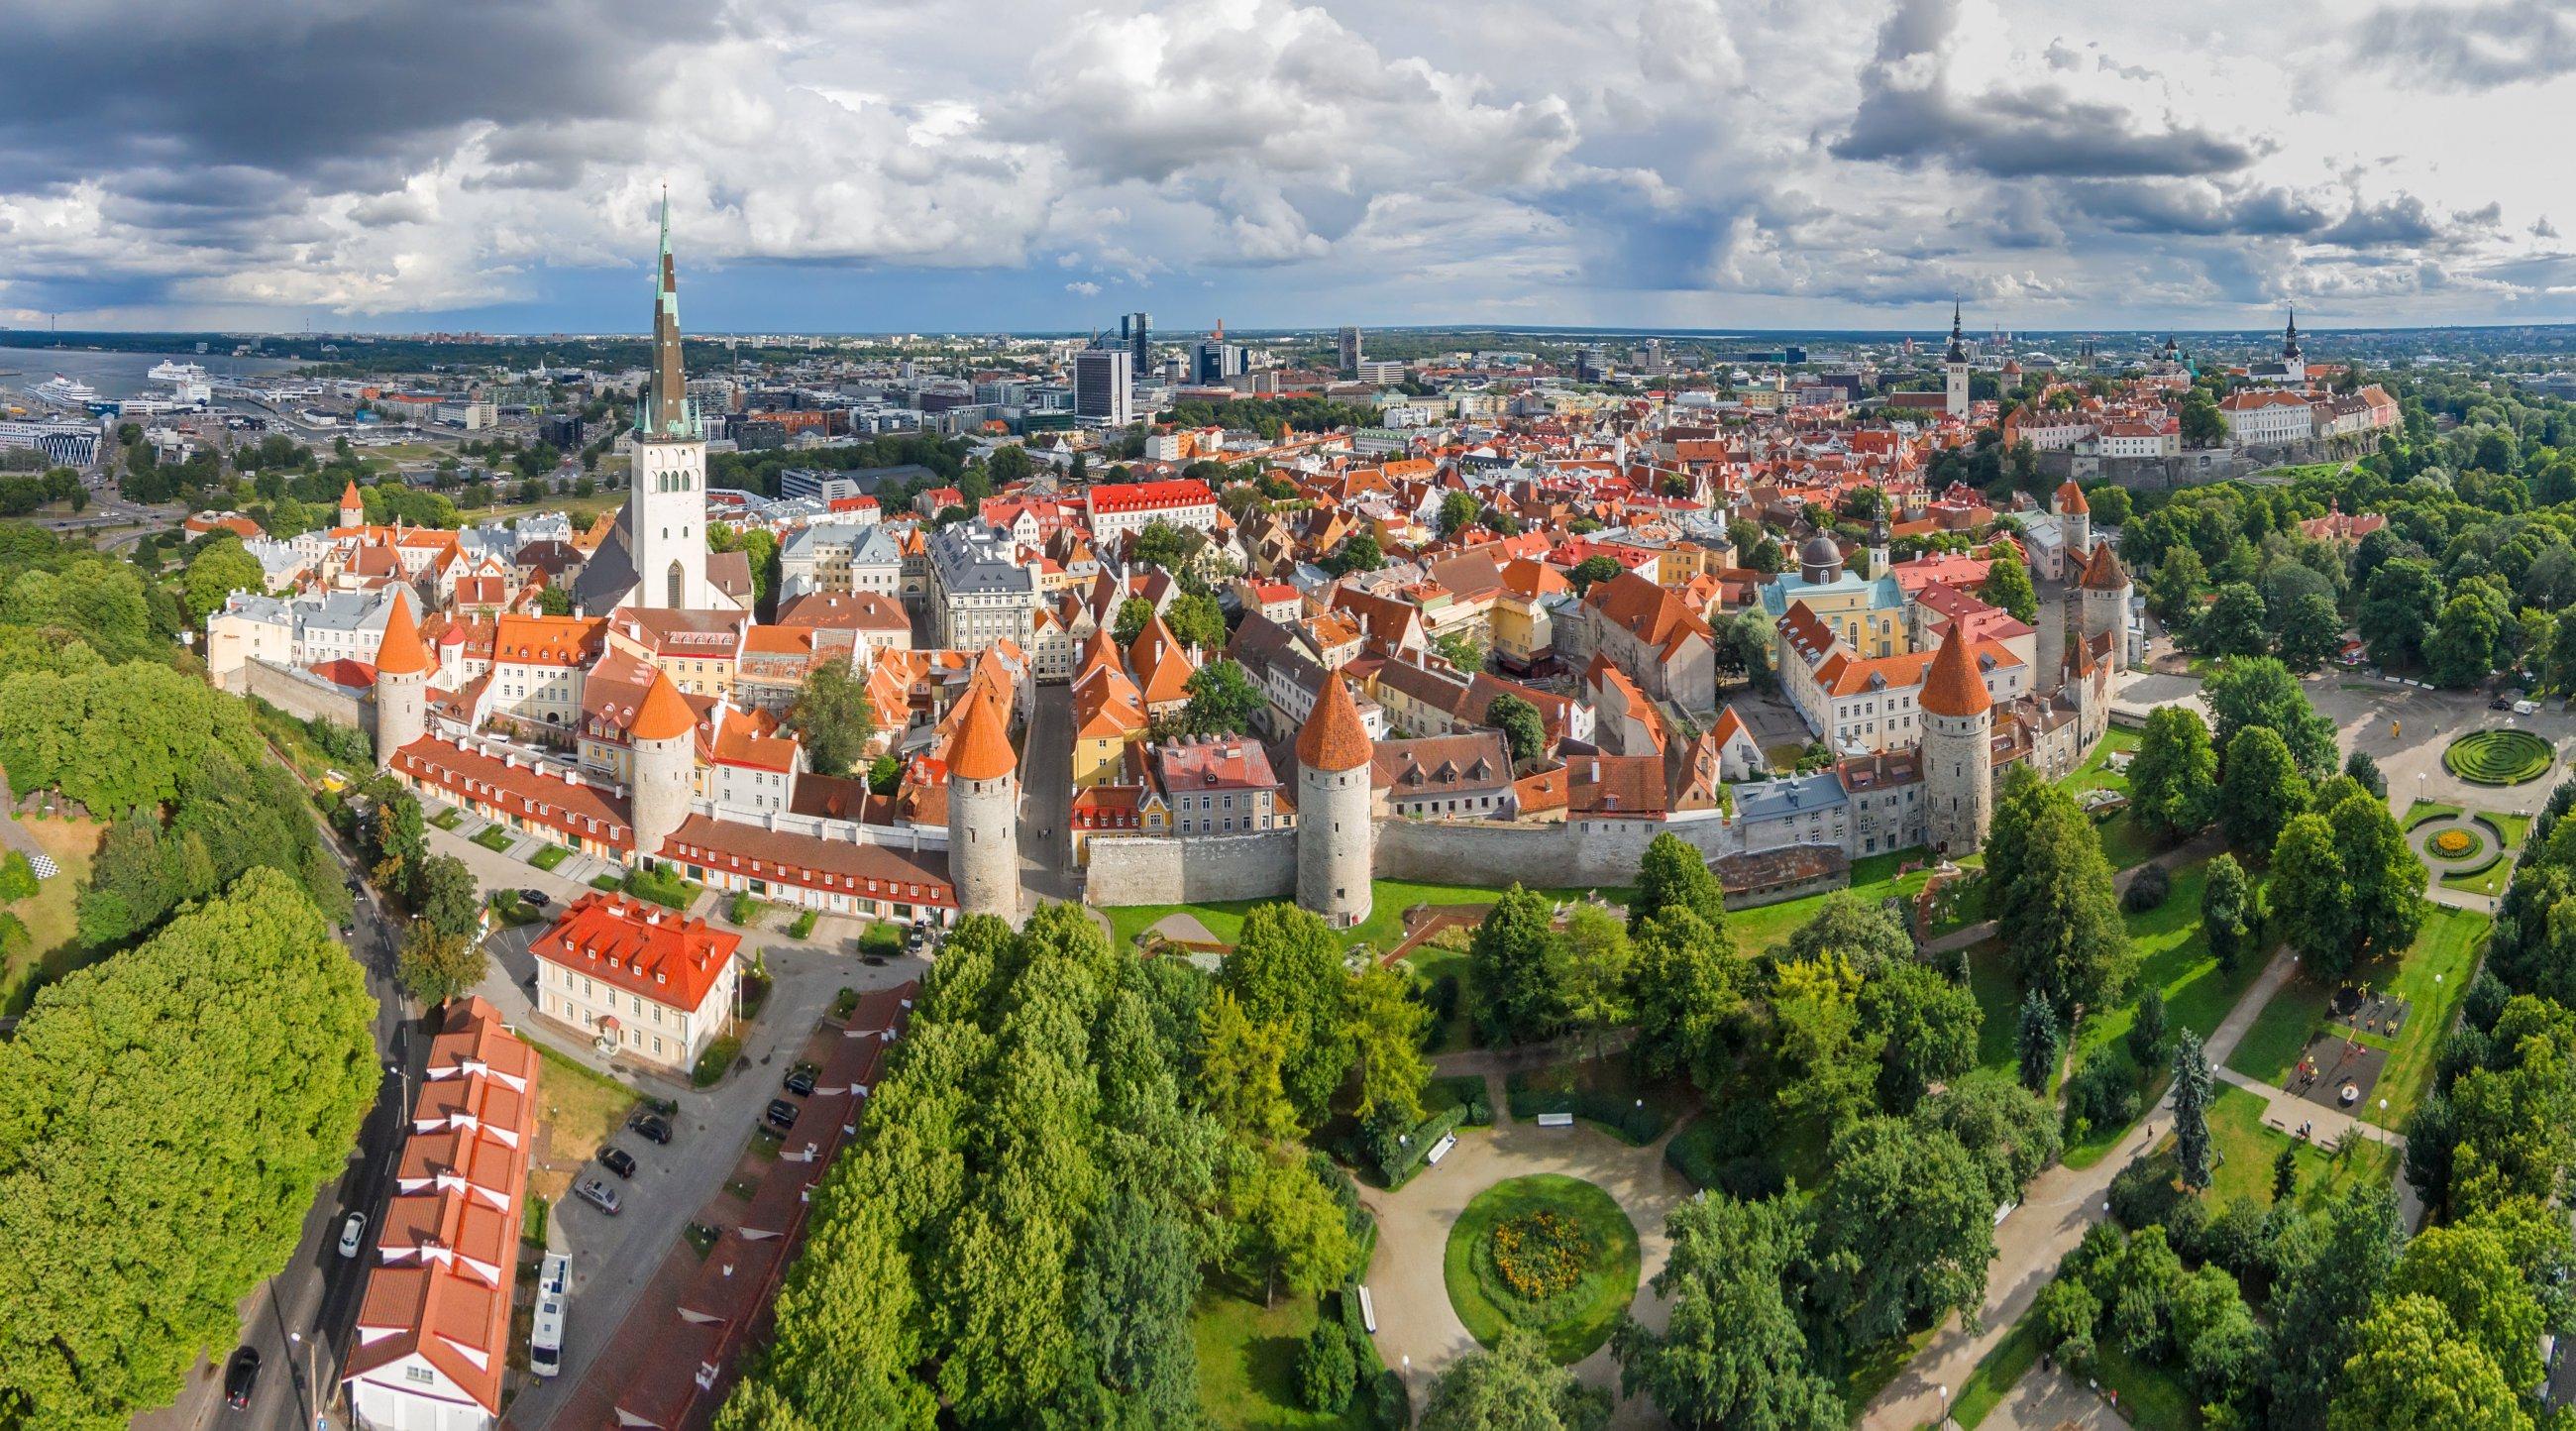 https://bubo.sk/uploads/galleries/7342/estonsko-tallinn-old-town-dji01385-panorama-tornid.jpg